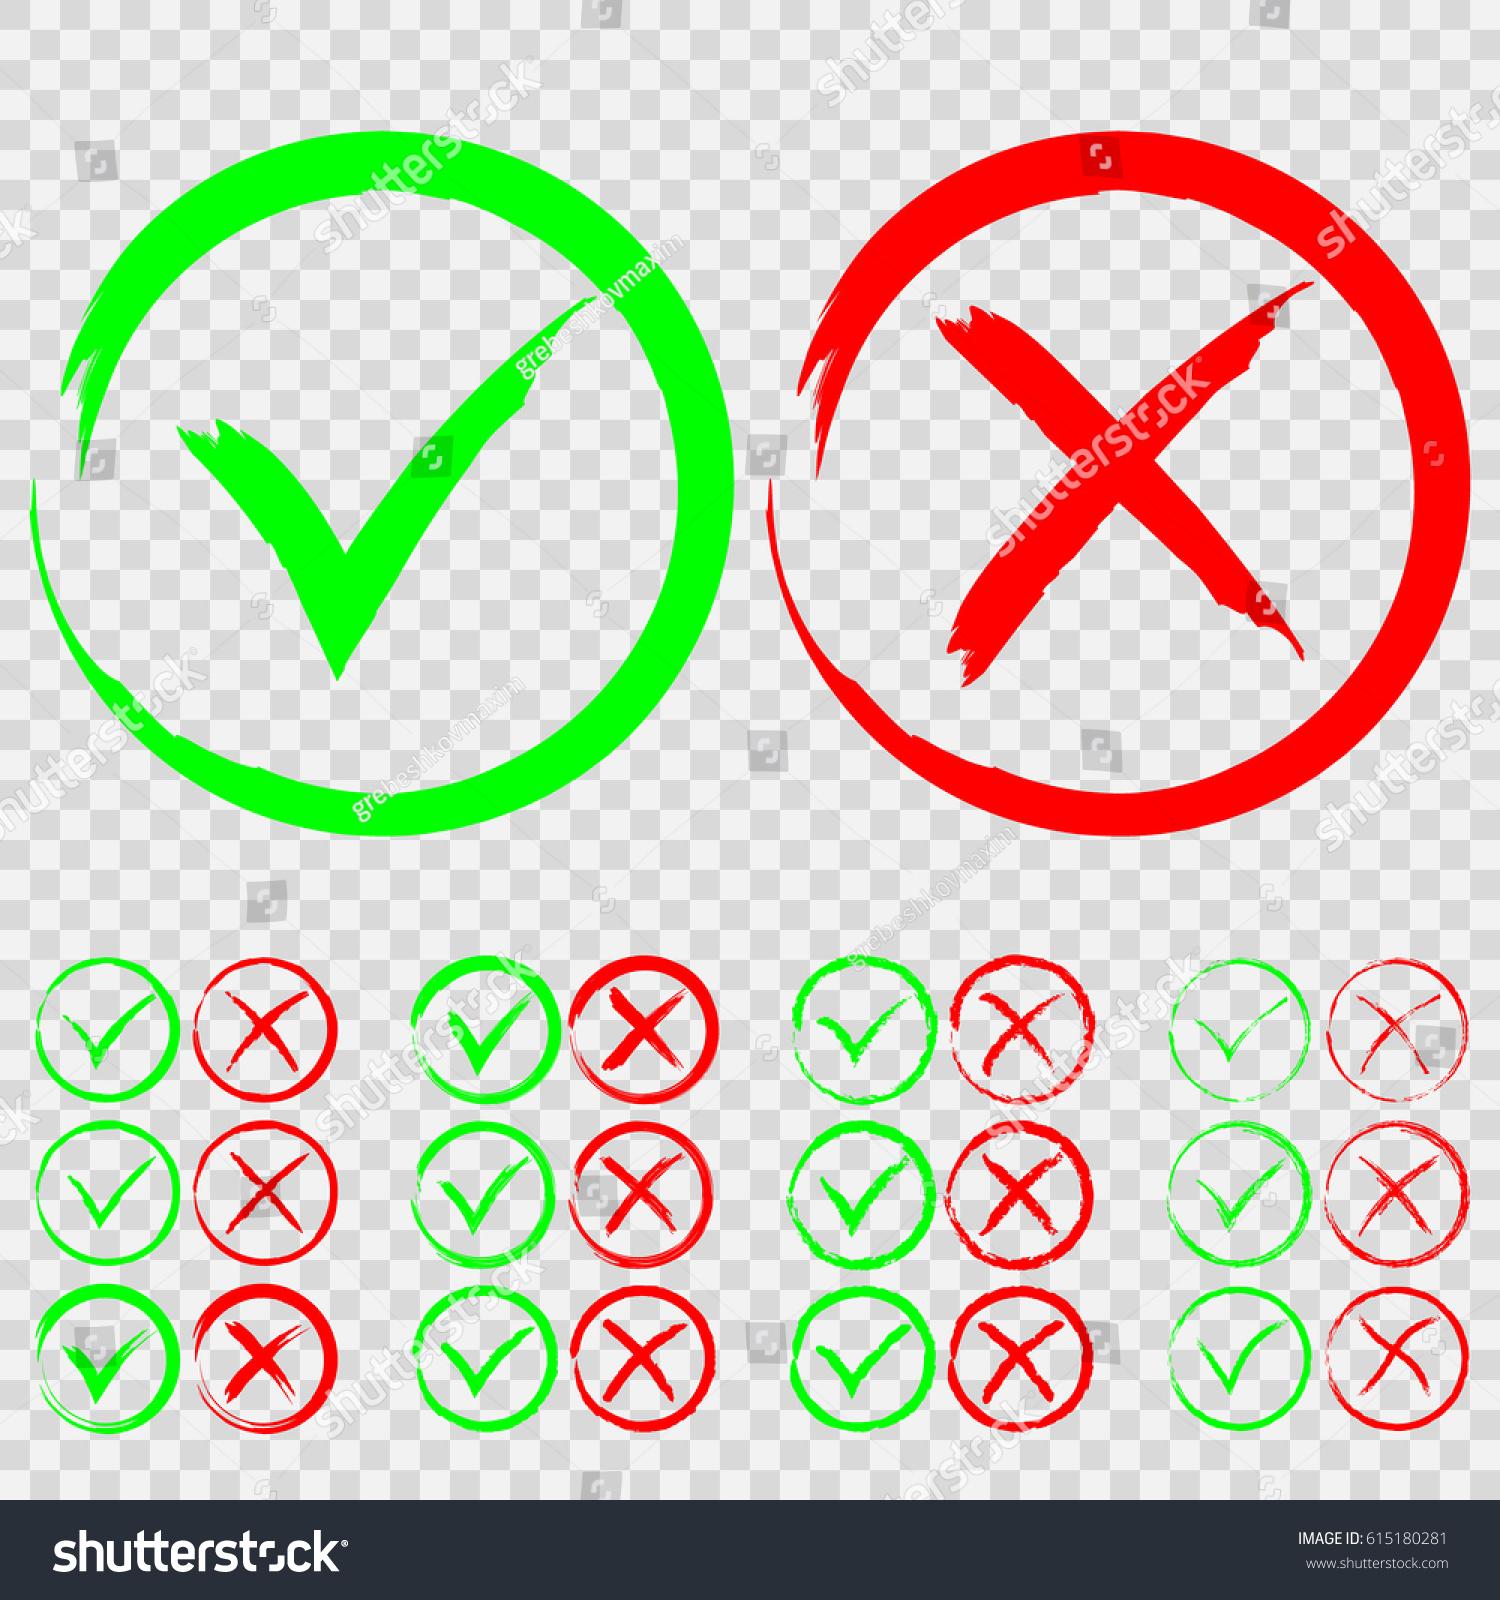 red x transparent background wwwpixsharkcom images